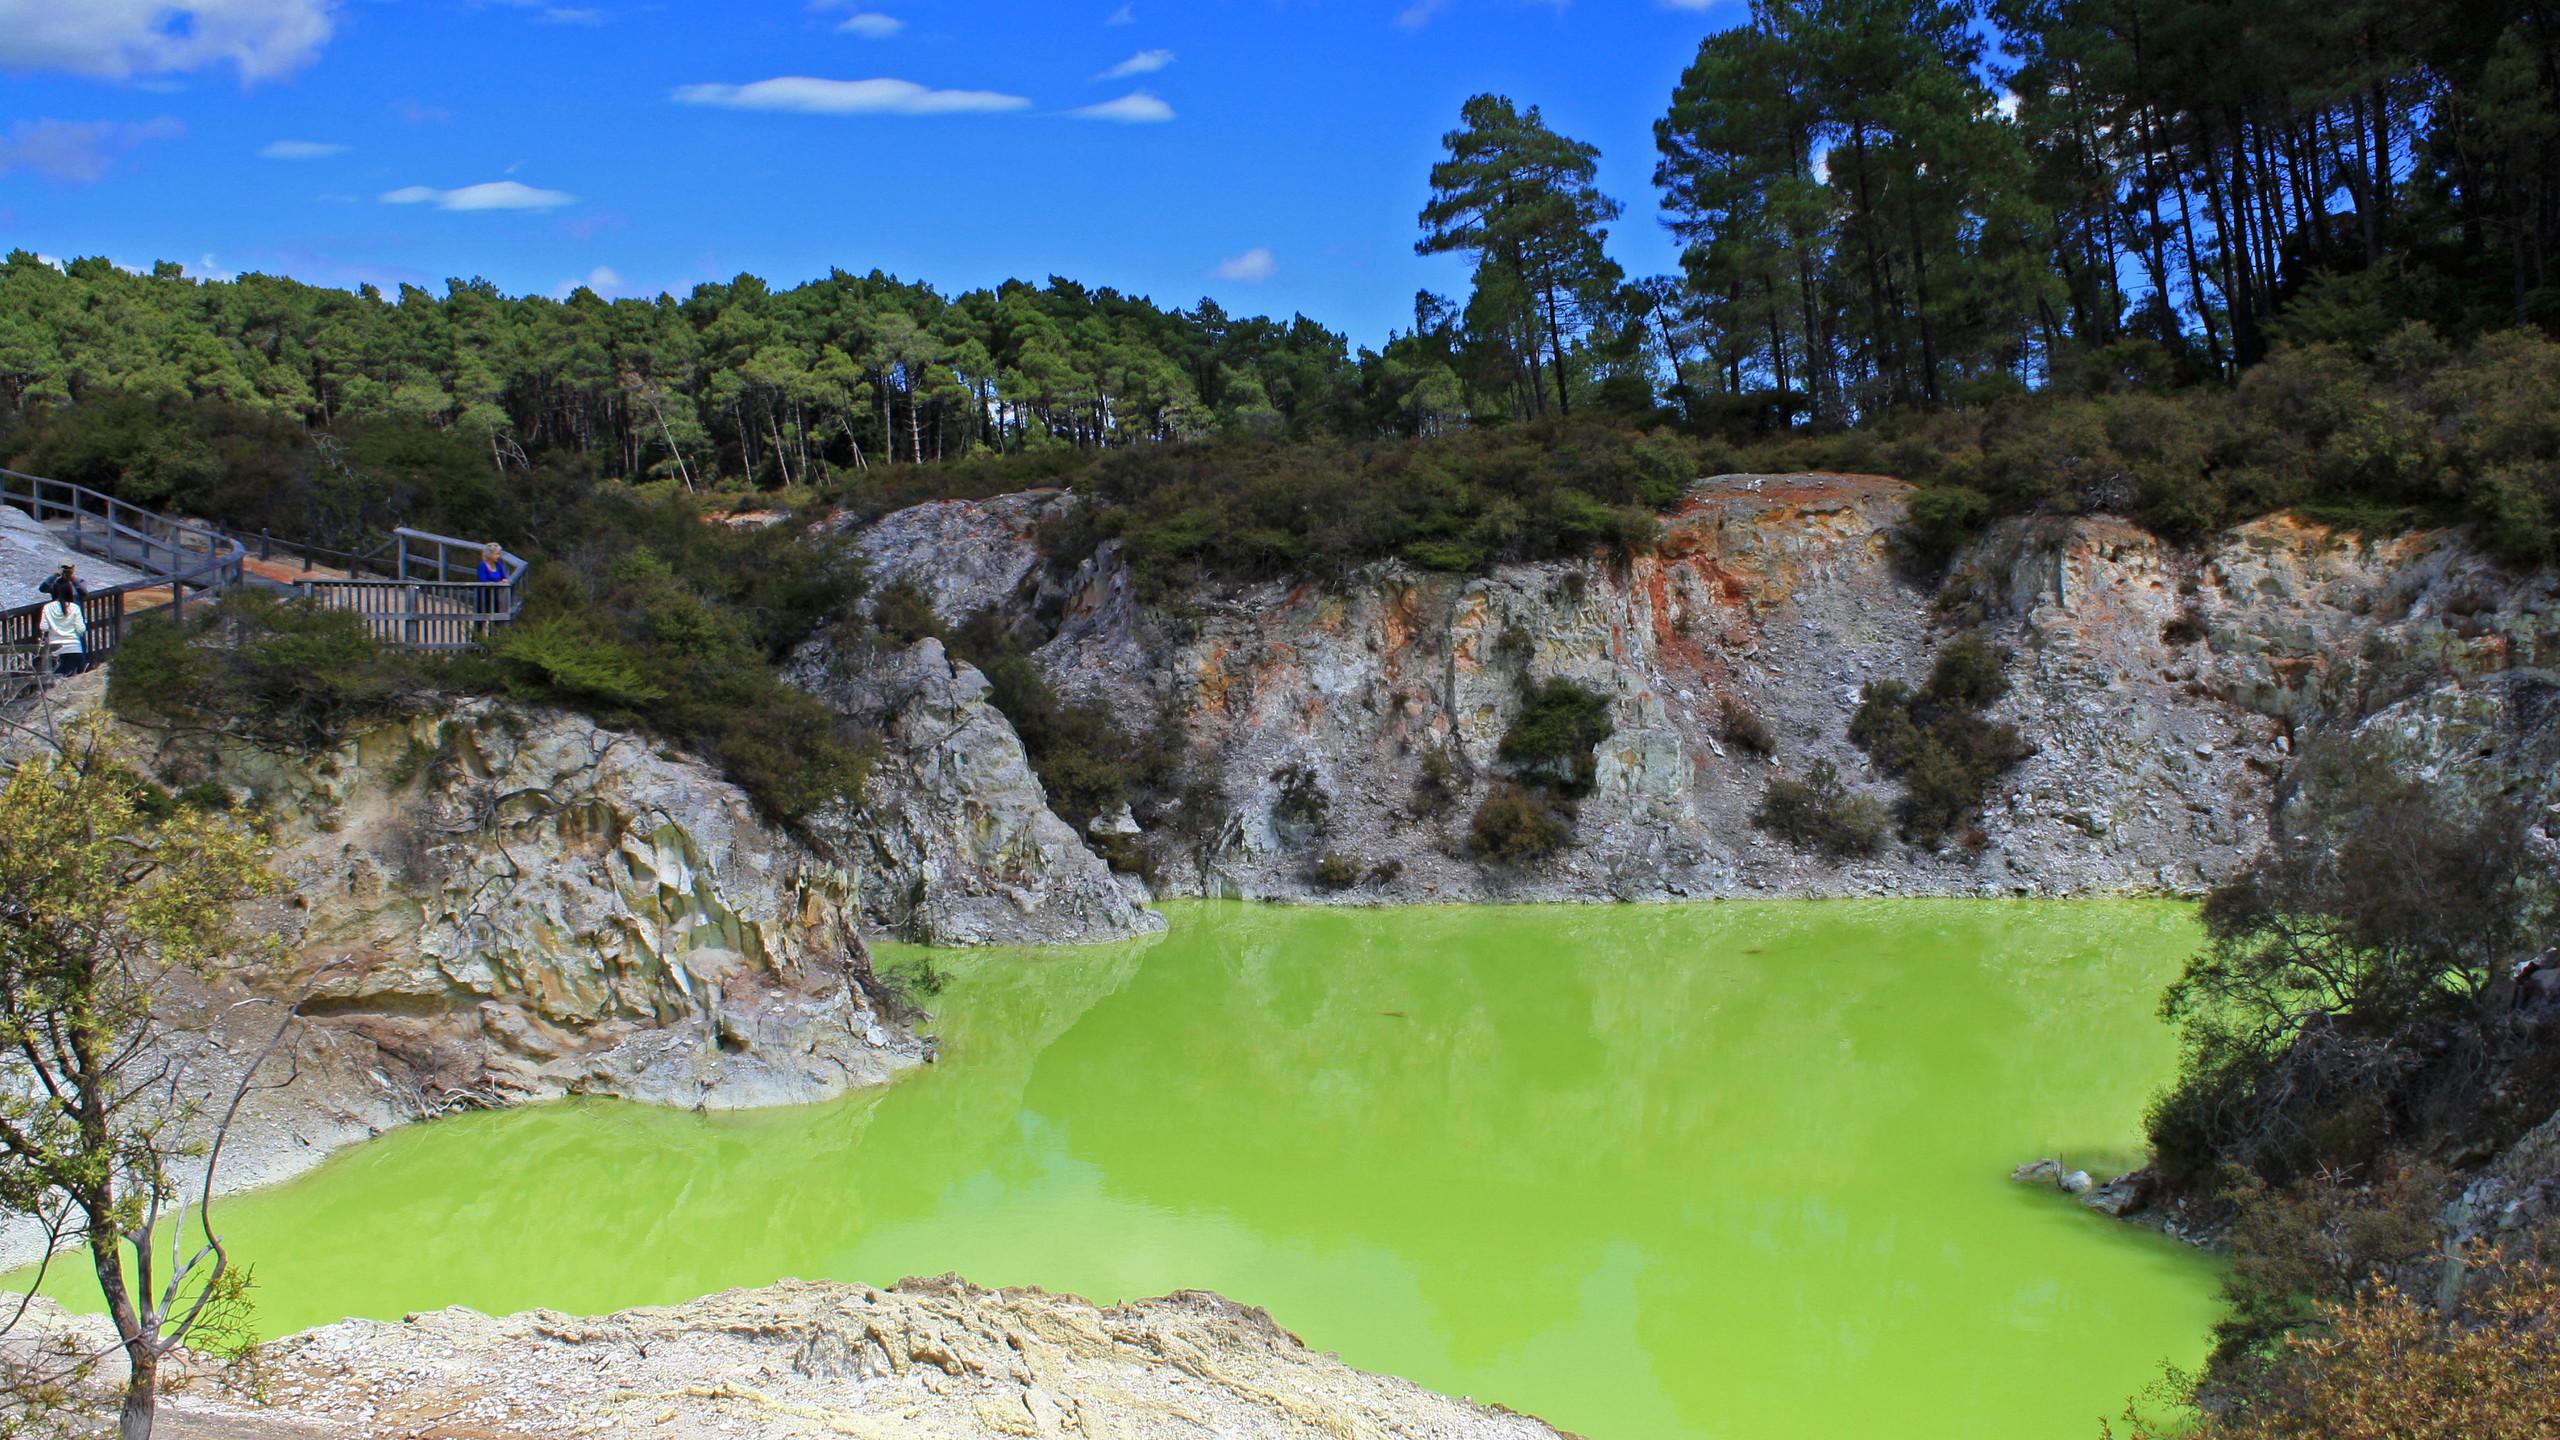 Wai-O-Tapu Thermal Wonderland, New Zealand attractions, New Zealand activities